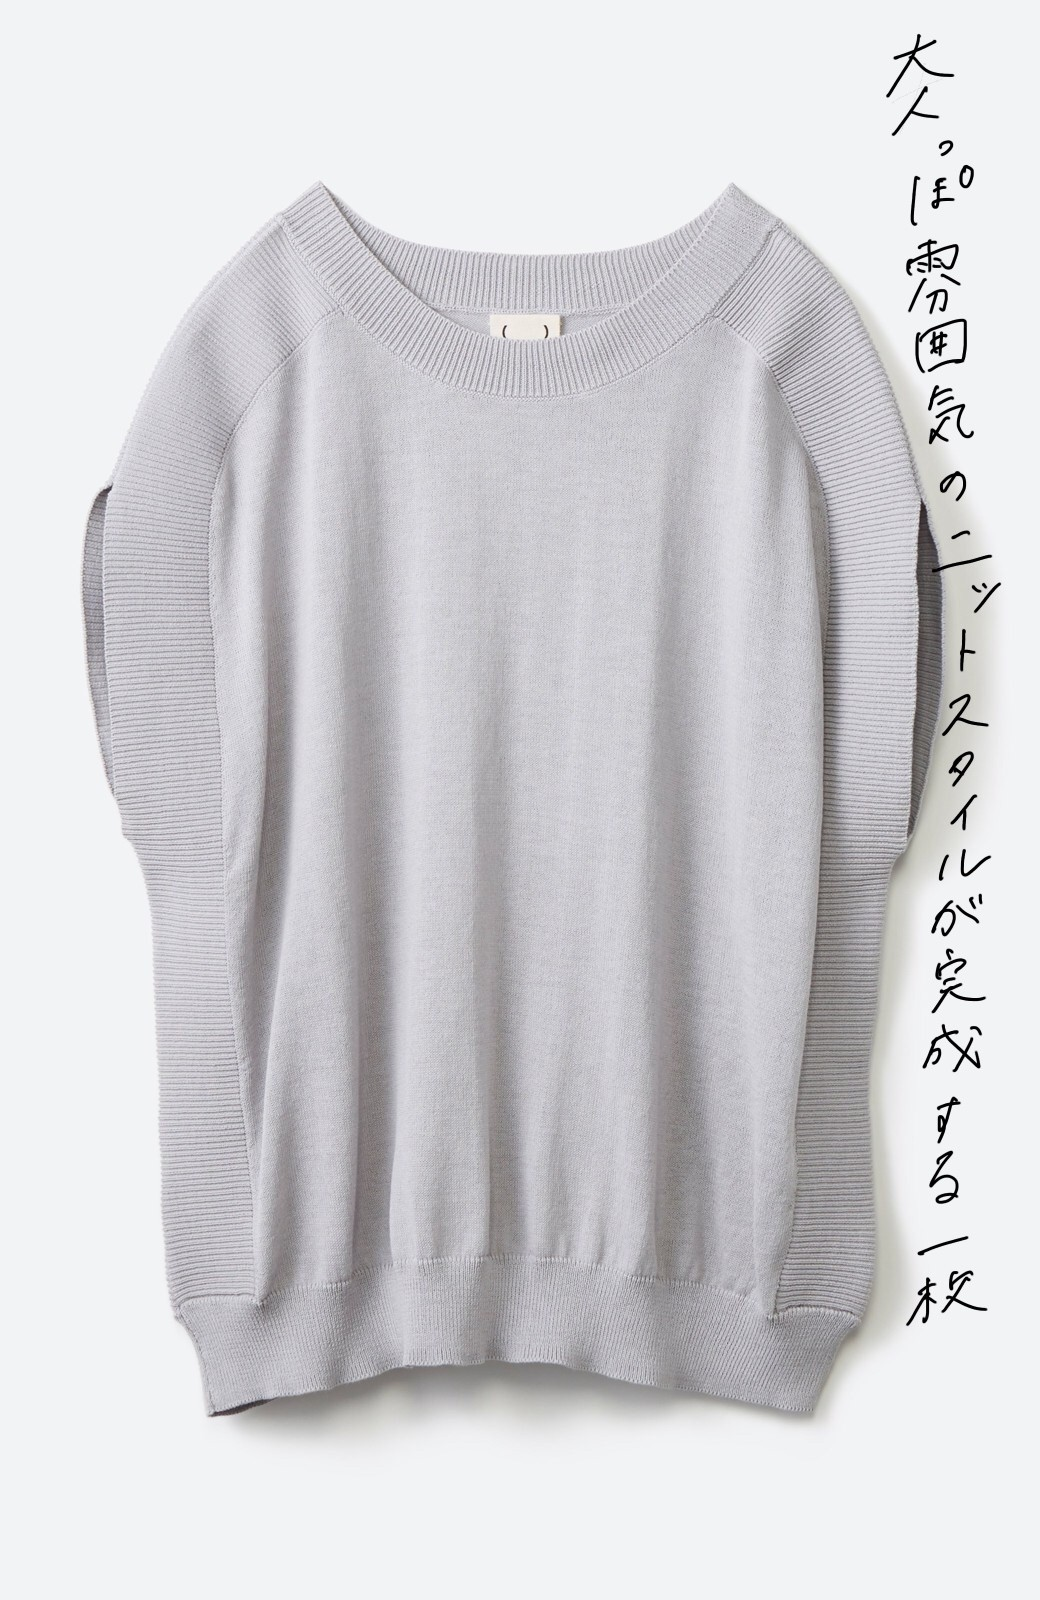 haco! カットソー感覚で着られる 洗えるオトナニットトップス by MAKORI <ライトグレー>の商品写真2